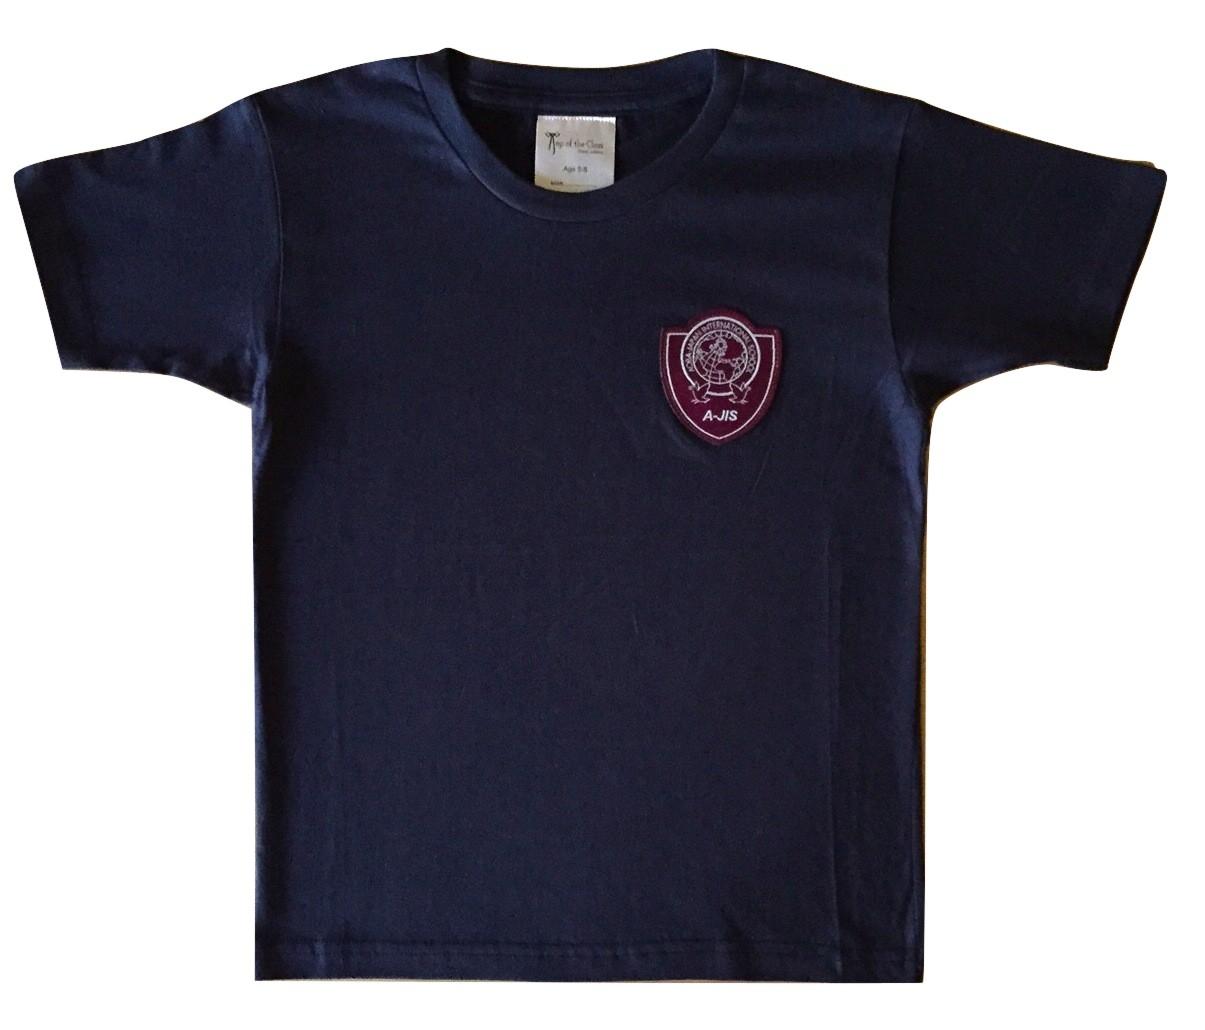 AJIS PE T shirt blue.jpg